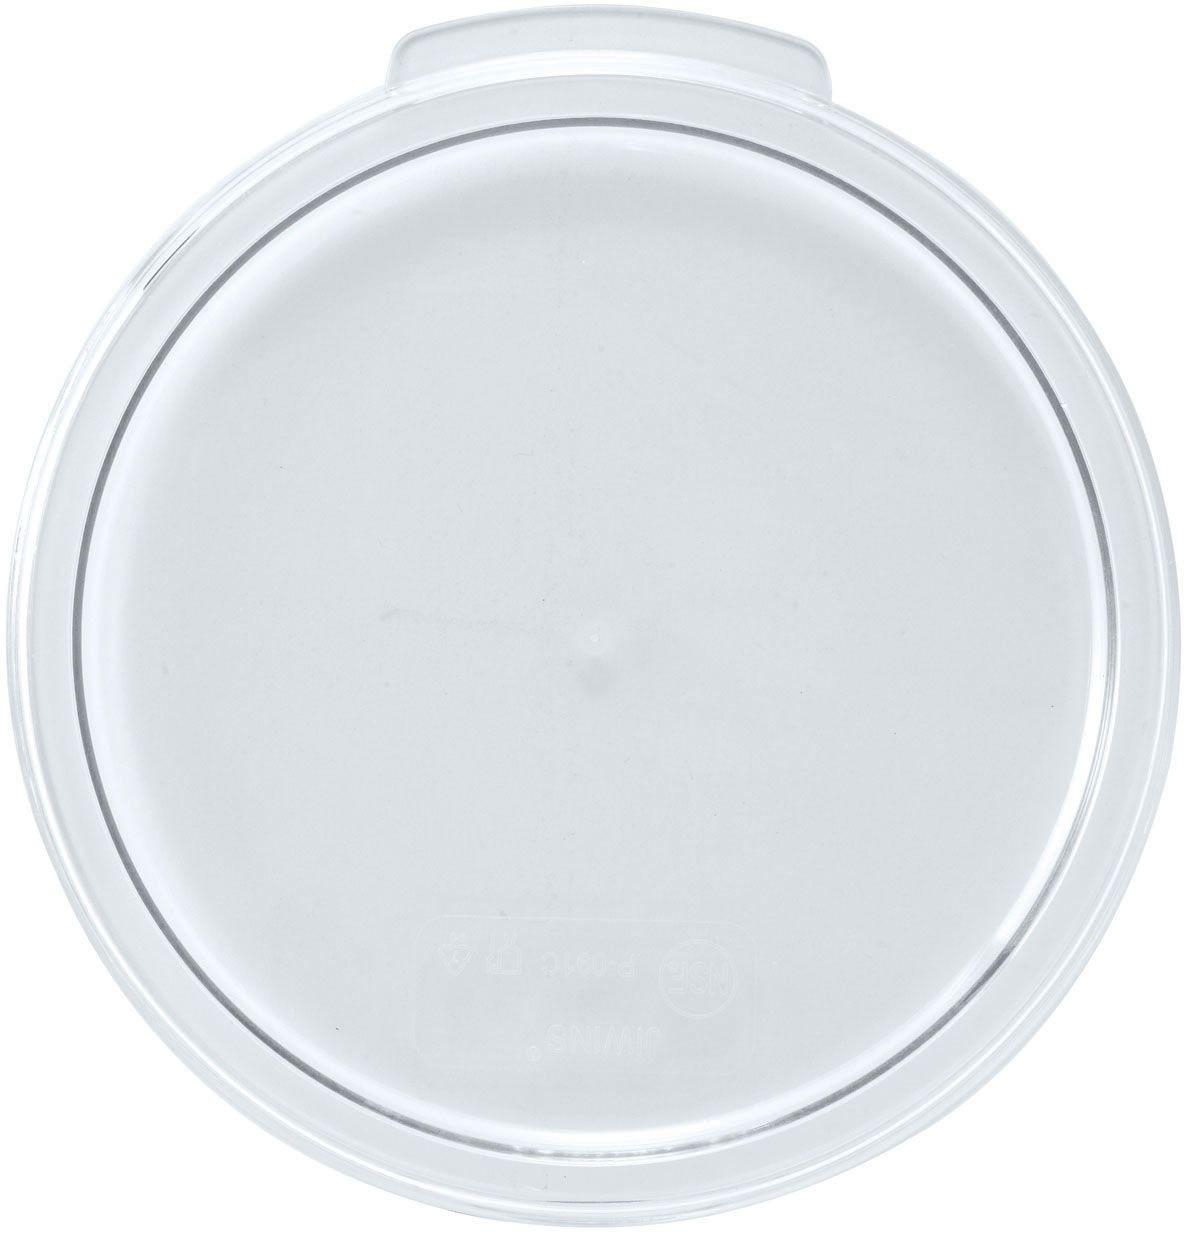 Winco PTRC-1C Translucent Food Storage Cover For 1 Qt. Container